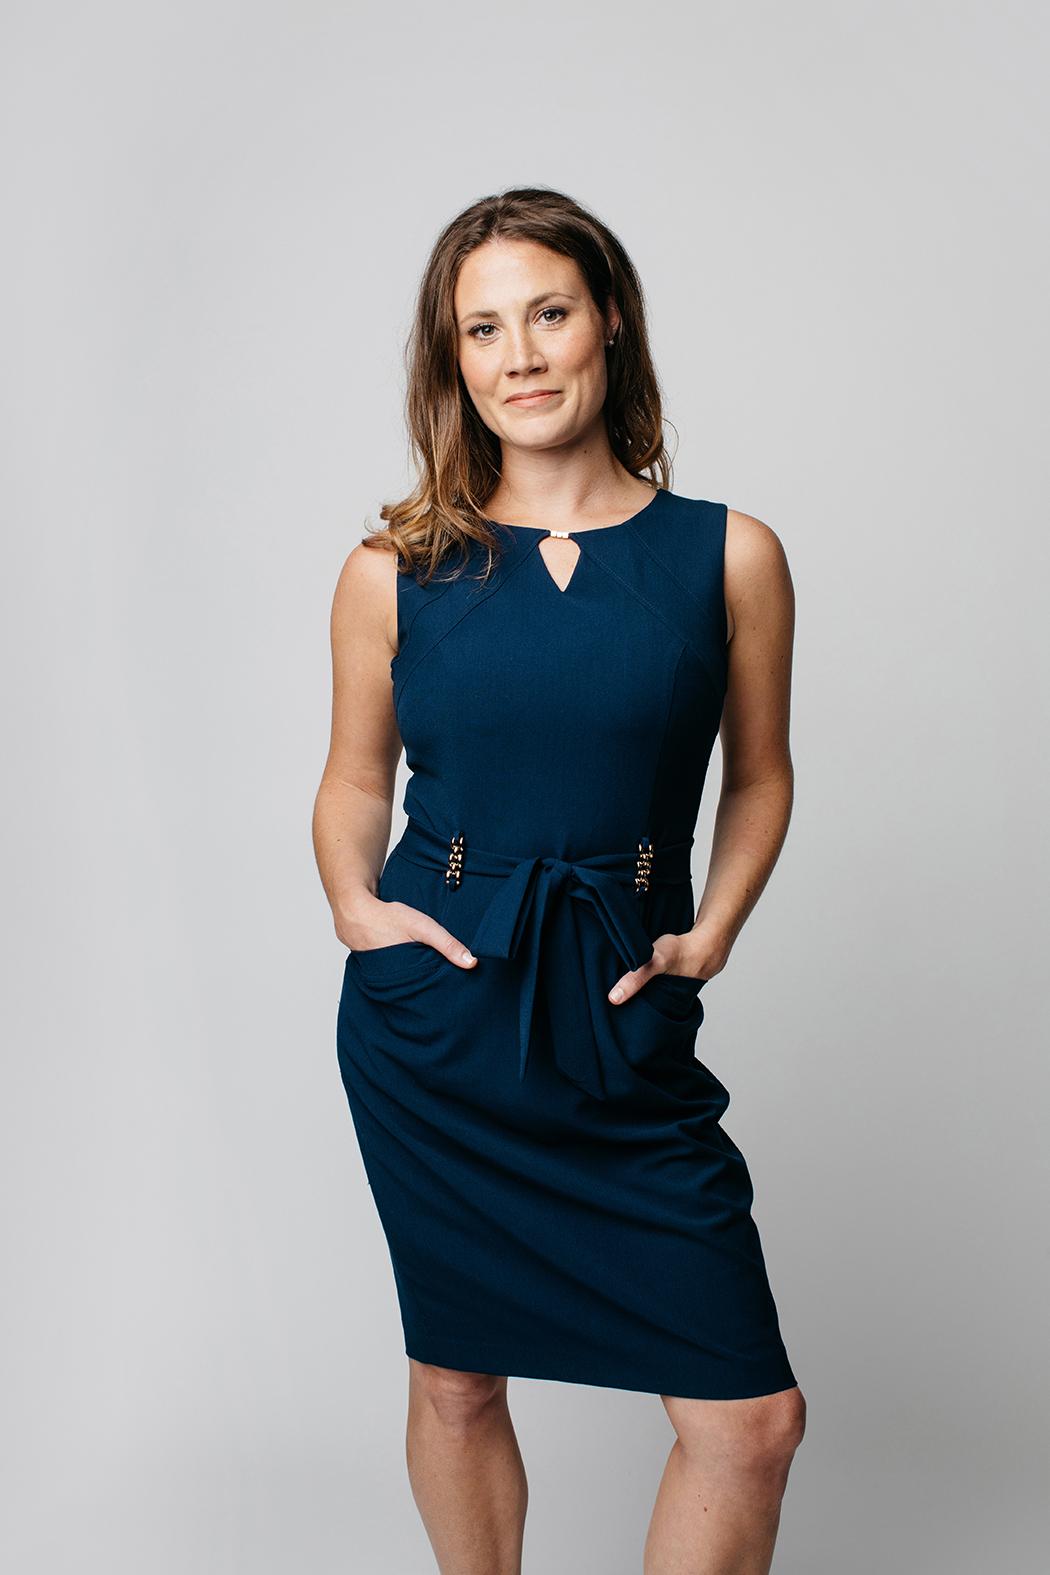 Nora Boyle